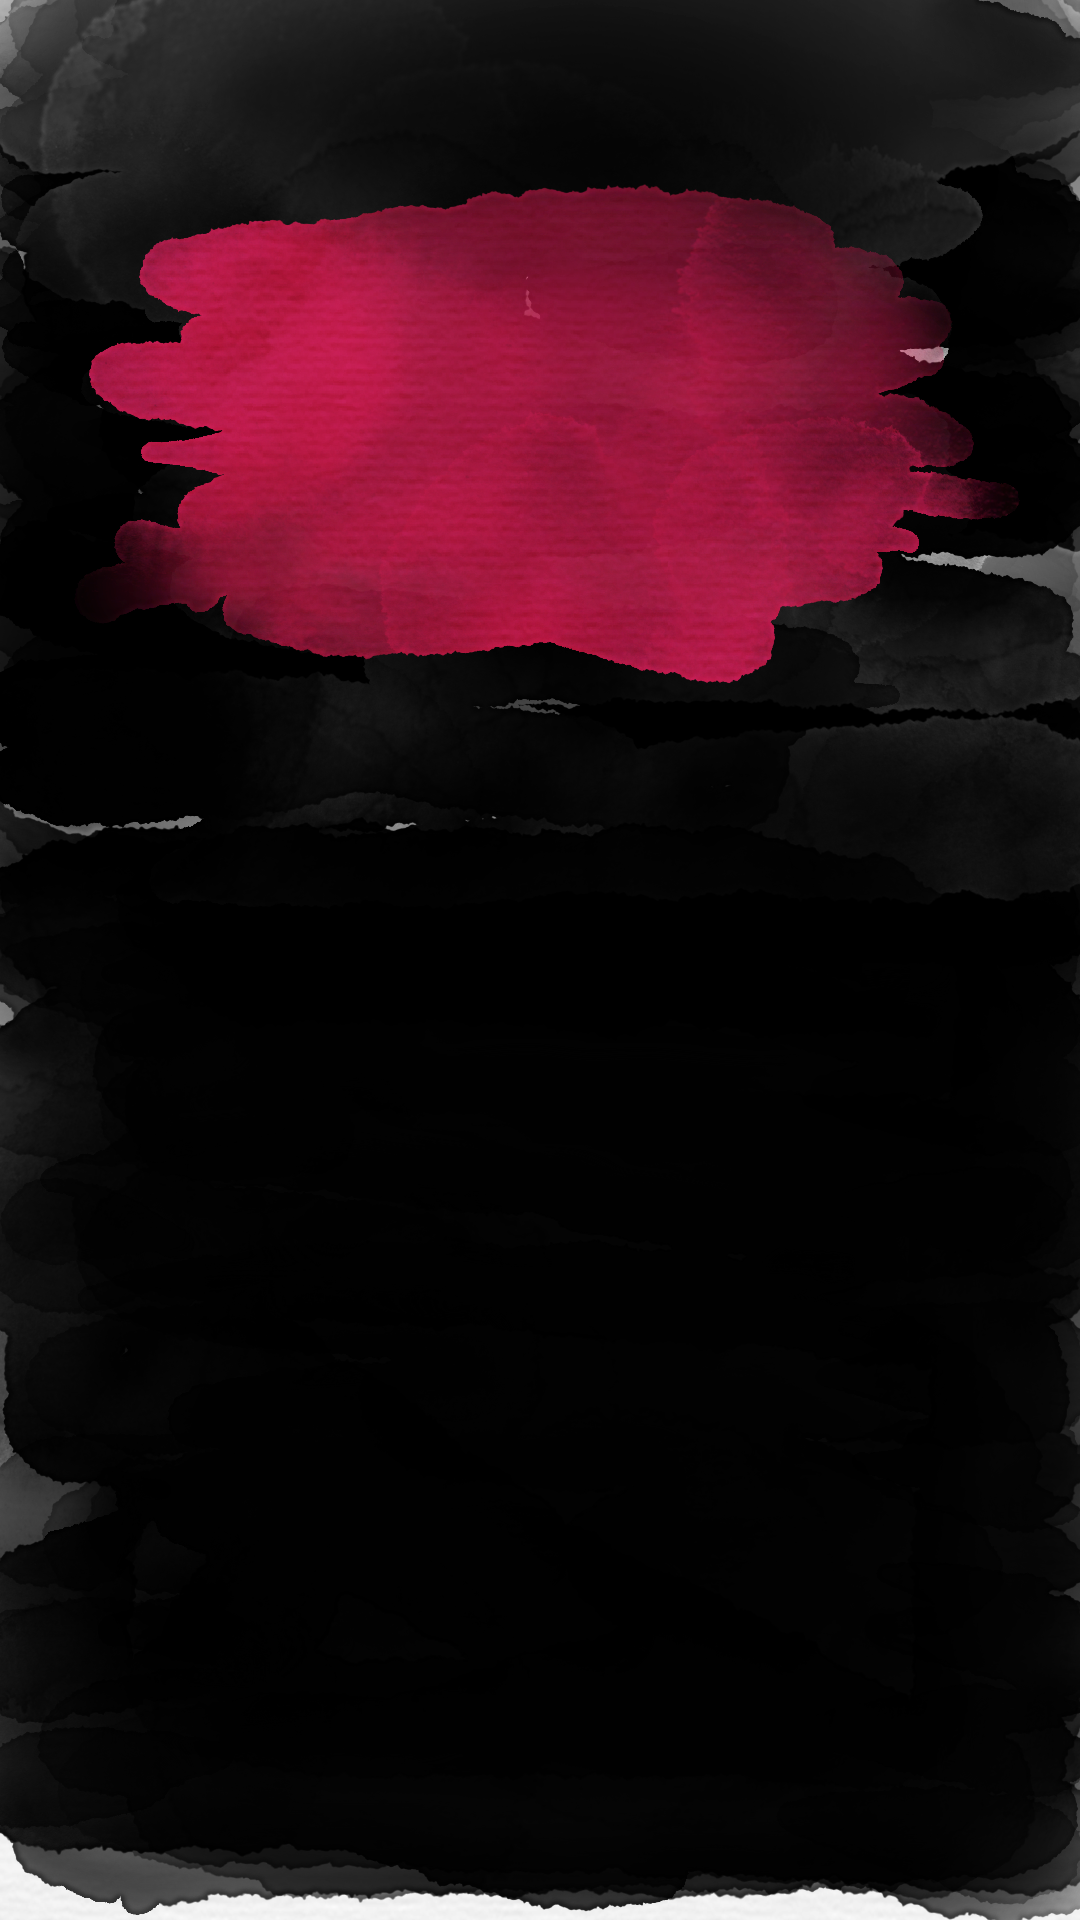 Iphone用のロック画面の壁紙 Iphone 6プラスロック画面の壁紙 1080x19 Wallpapertip